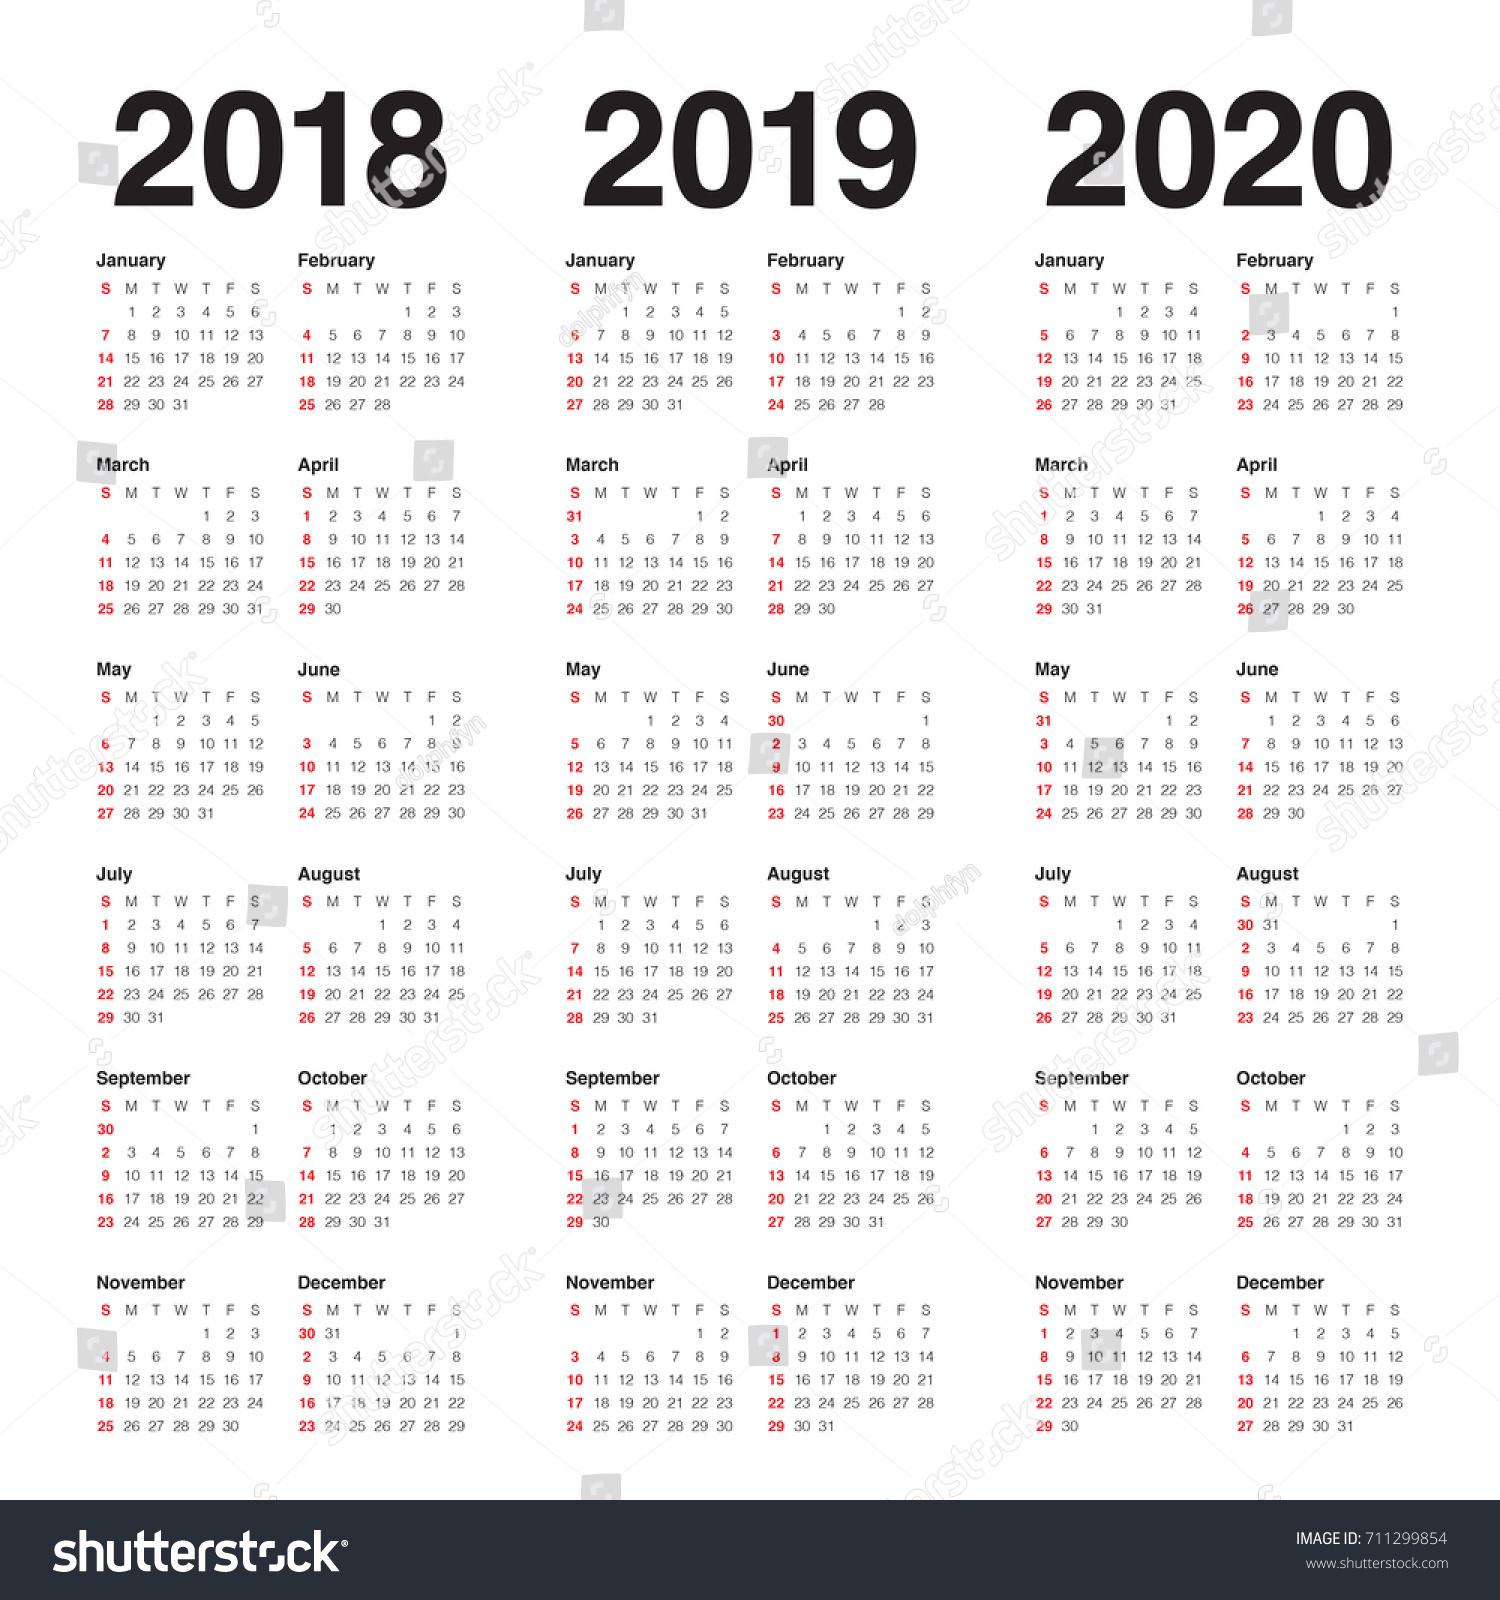 3 year calendar template